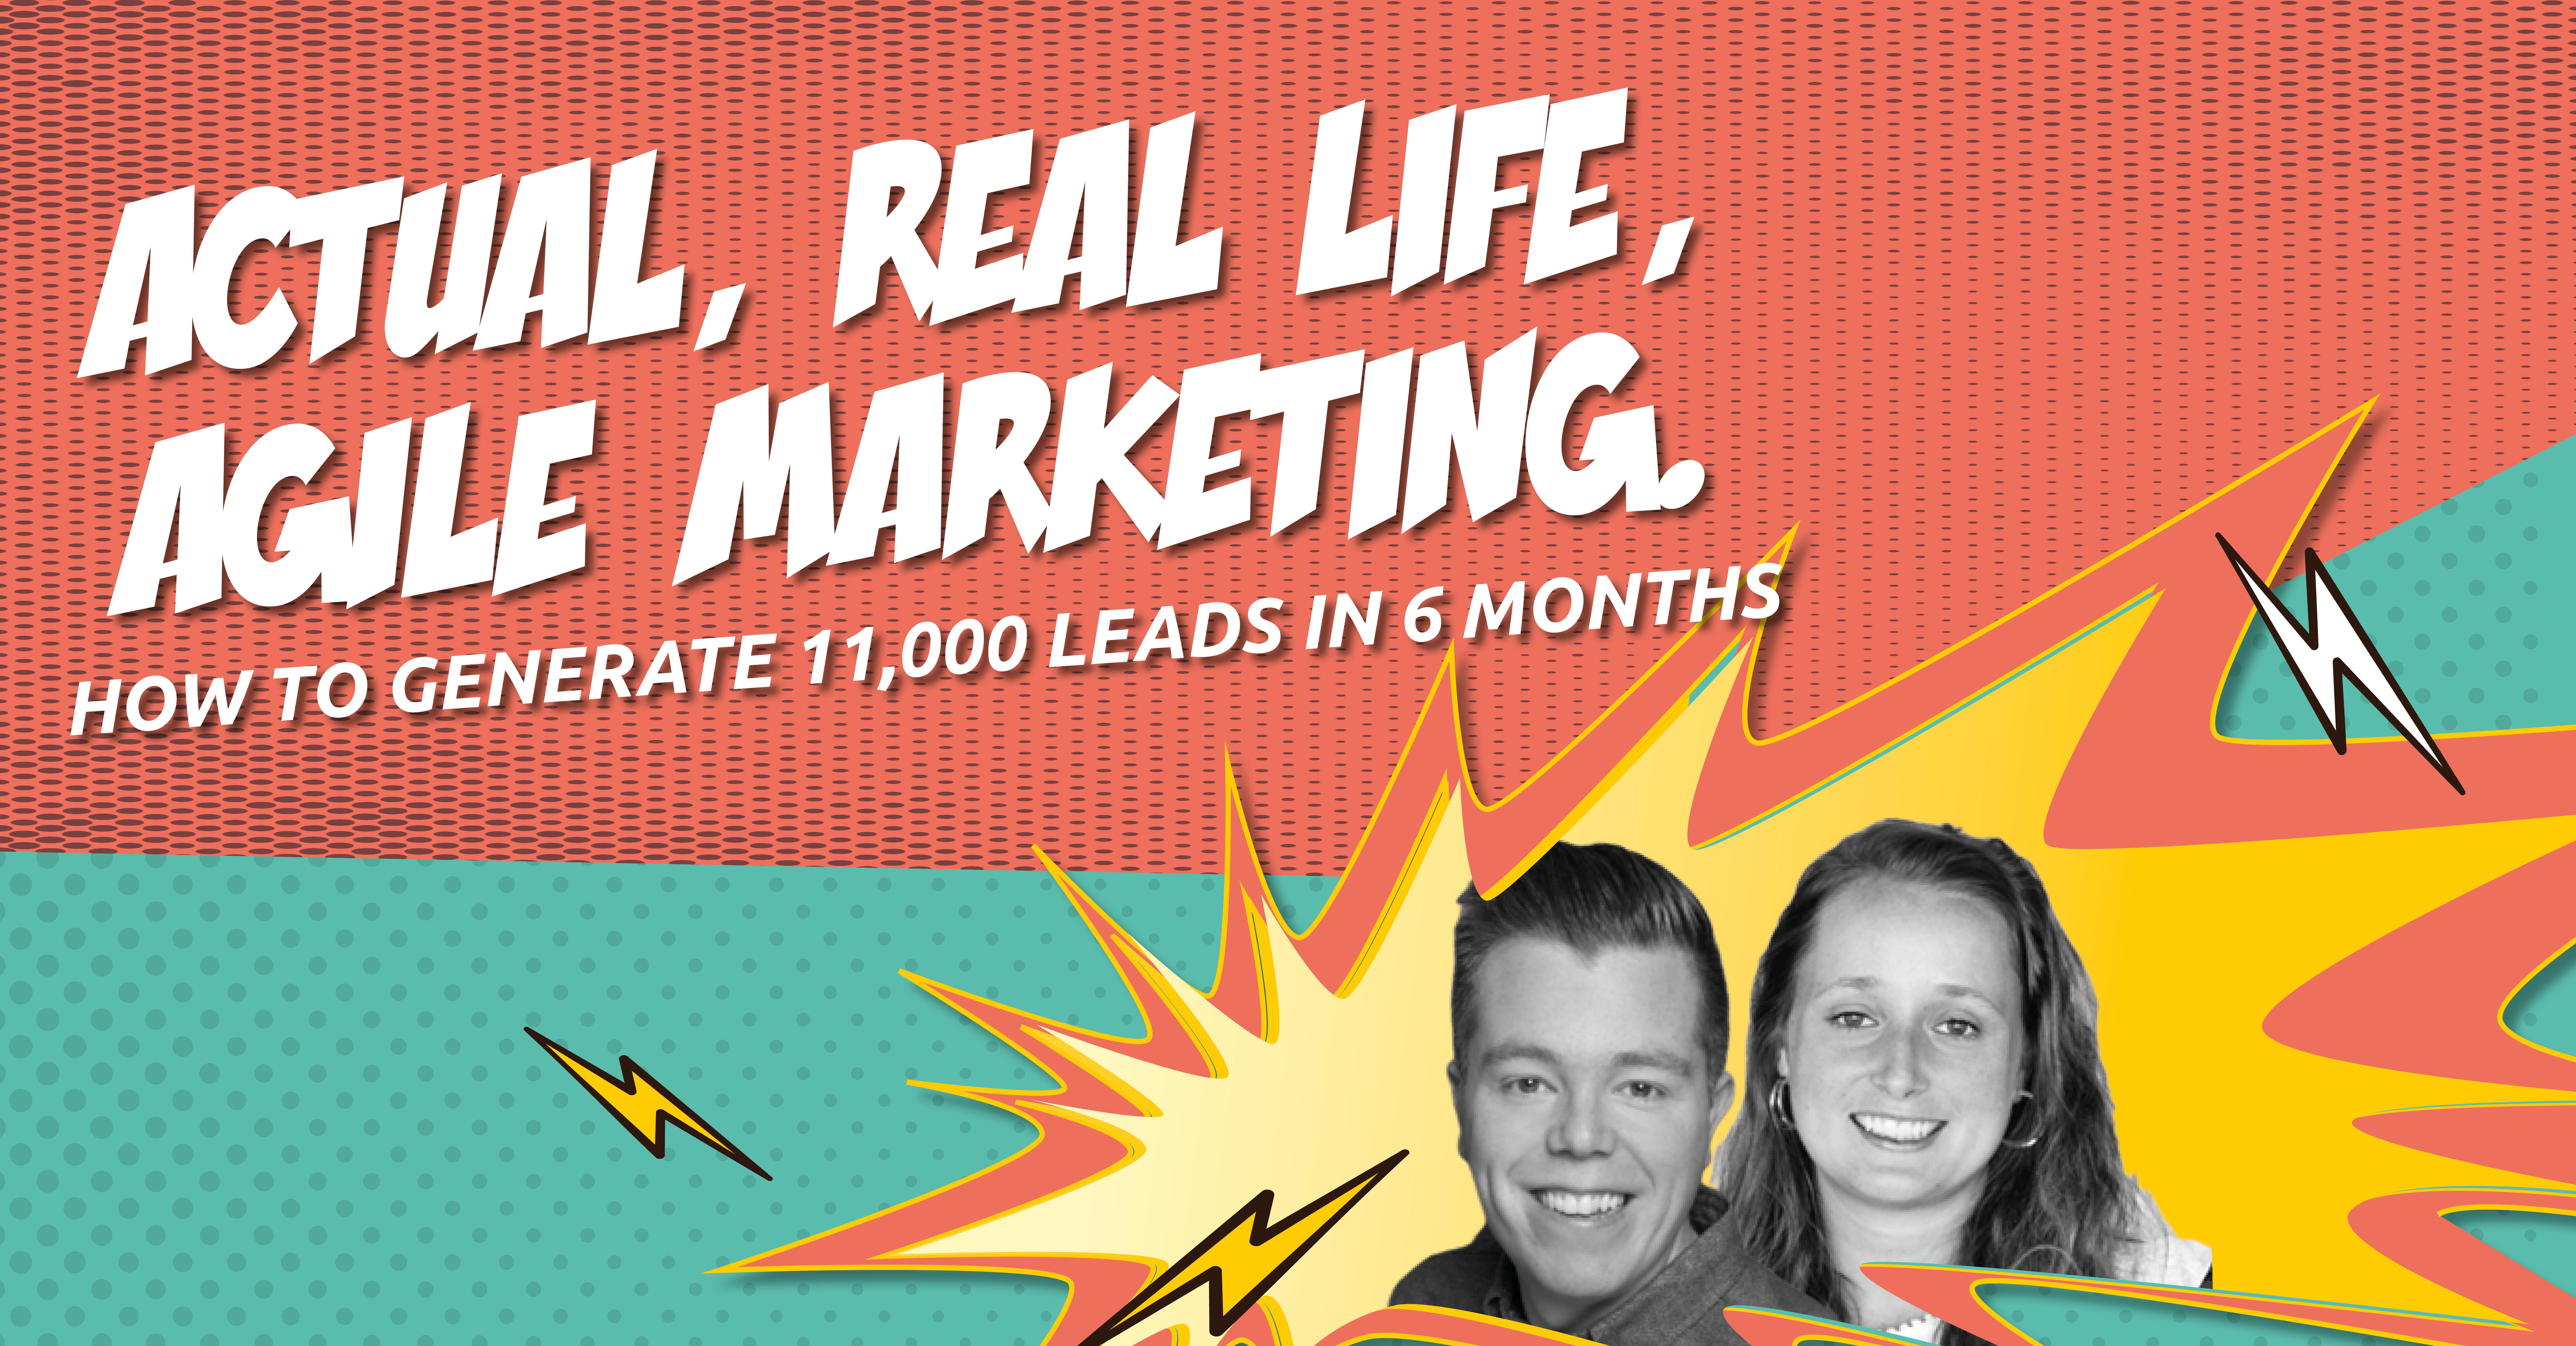 Landing Page Header - Actual Real Life Marketing